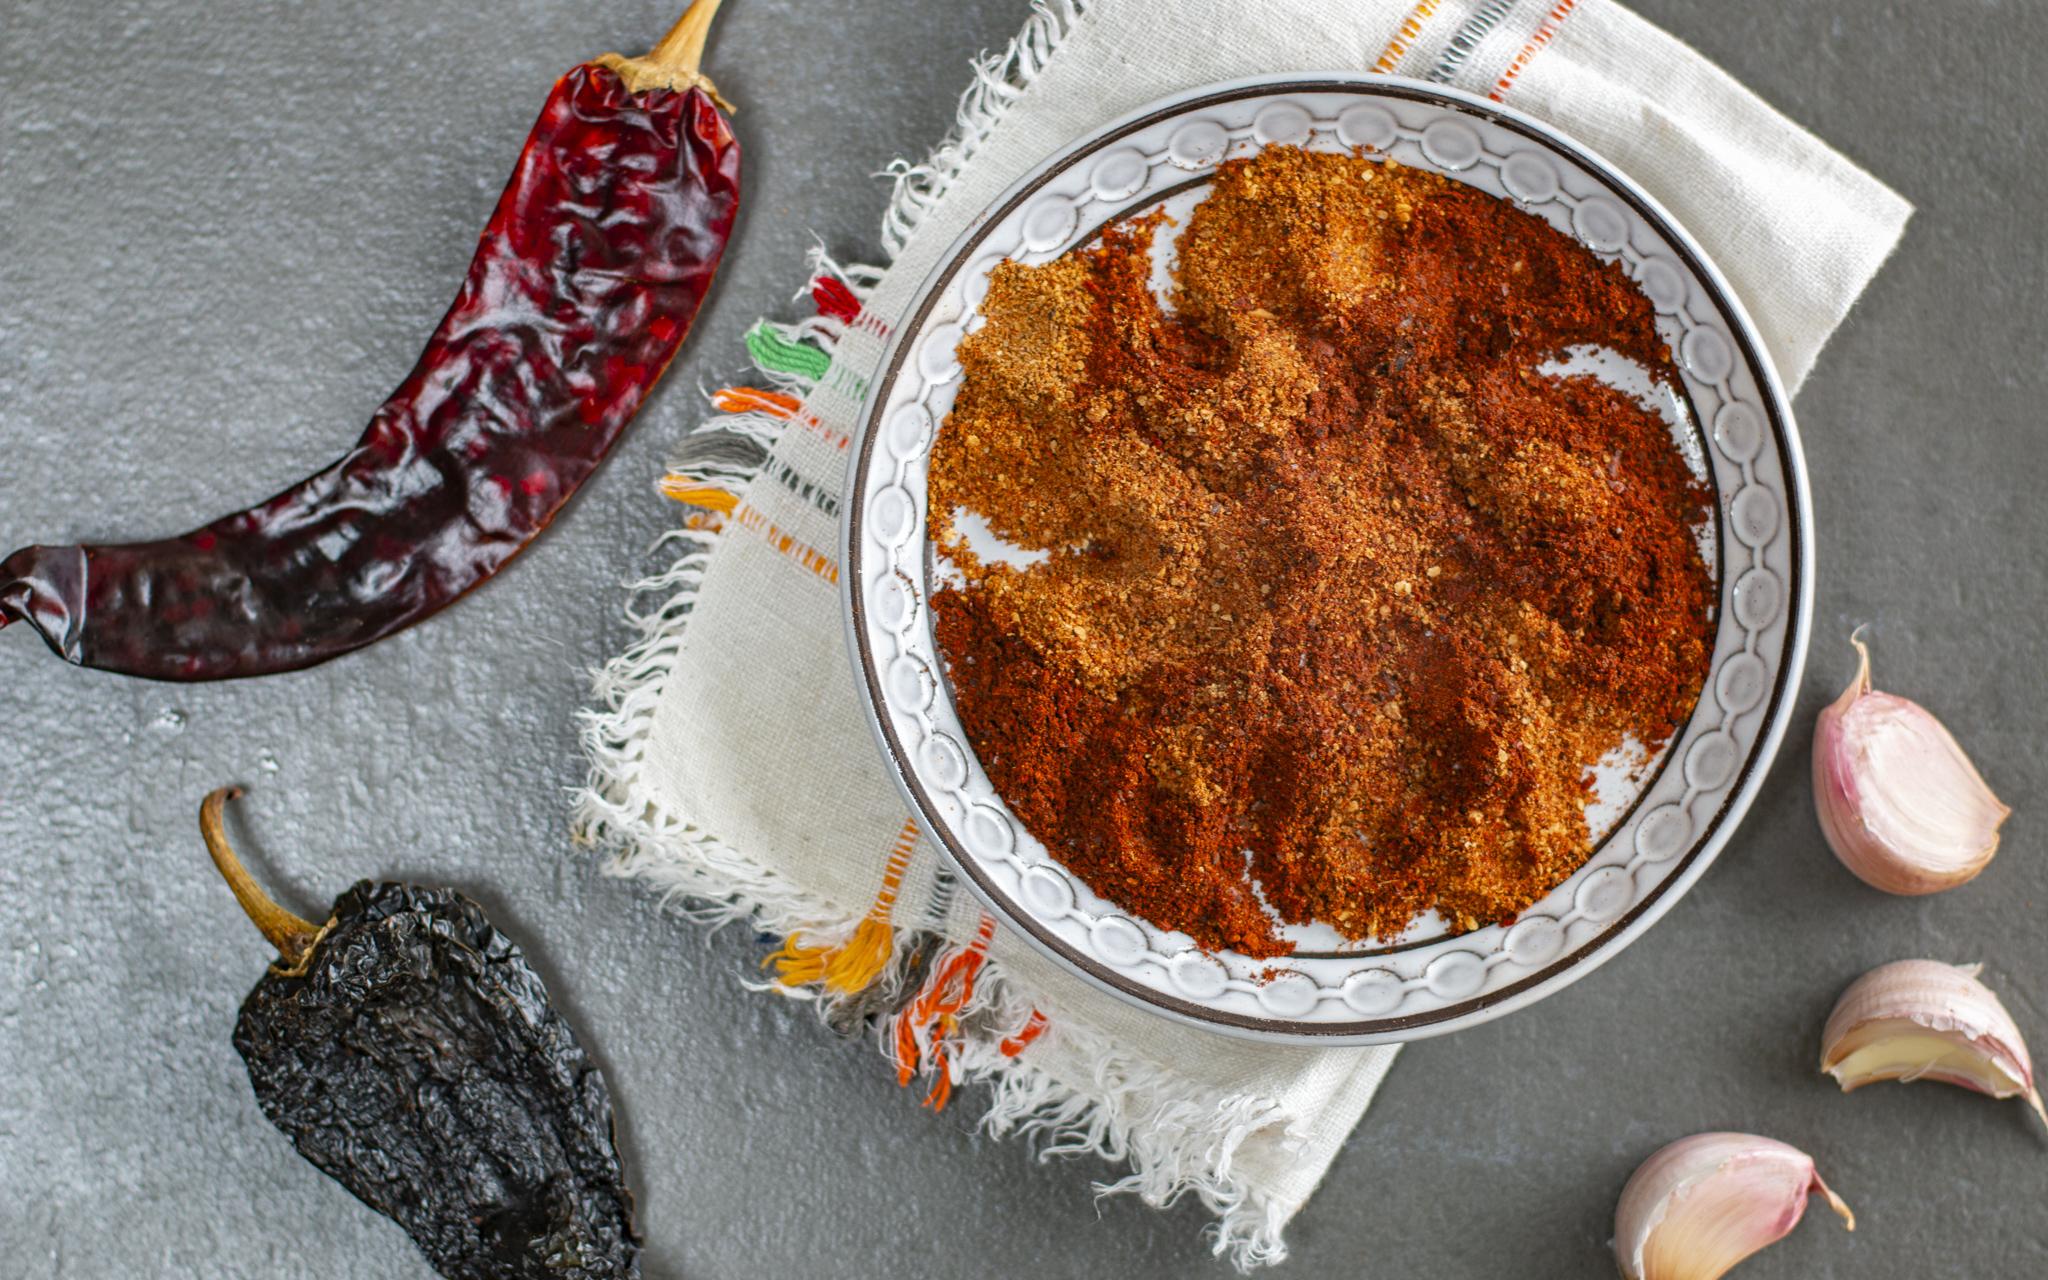 Homemade chili powder with Guindilla Chiles and Pasilla Negro Chiles